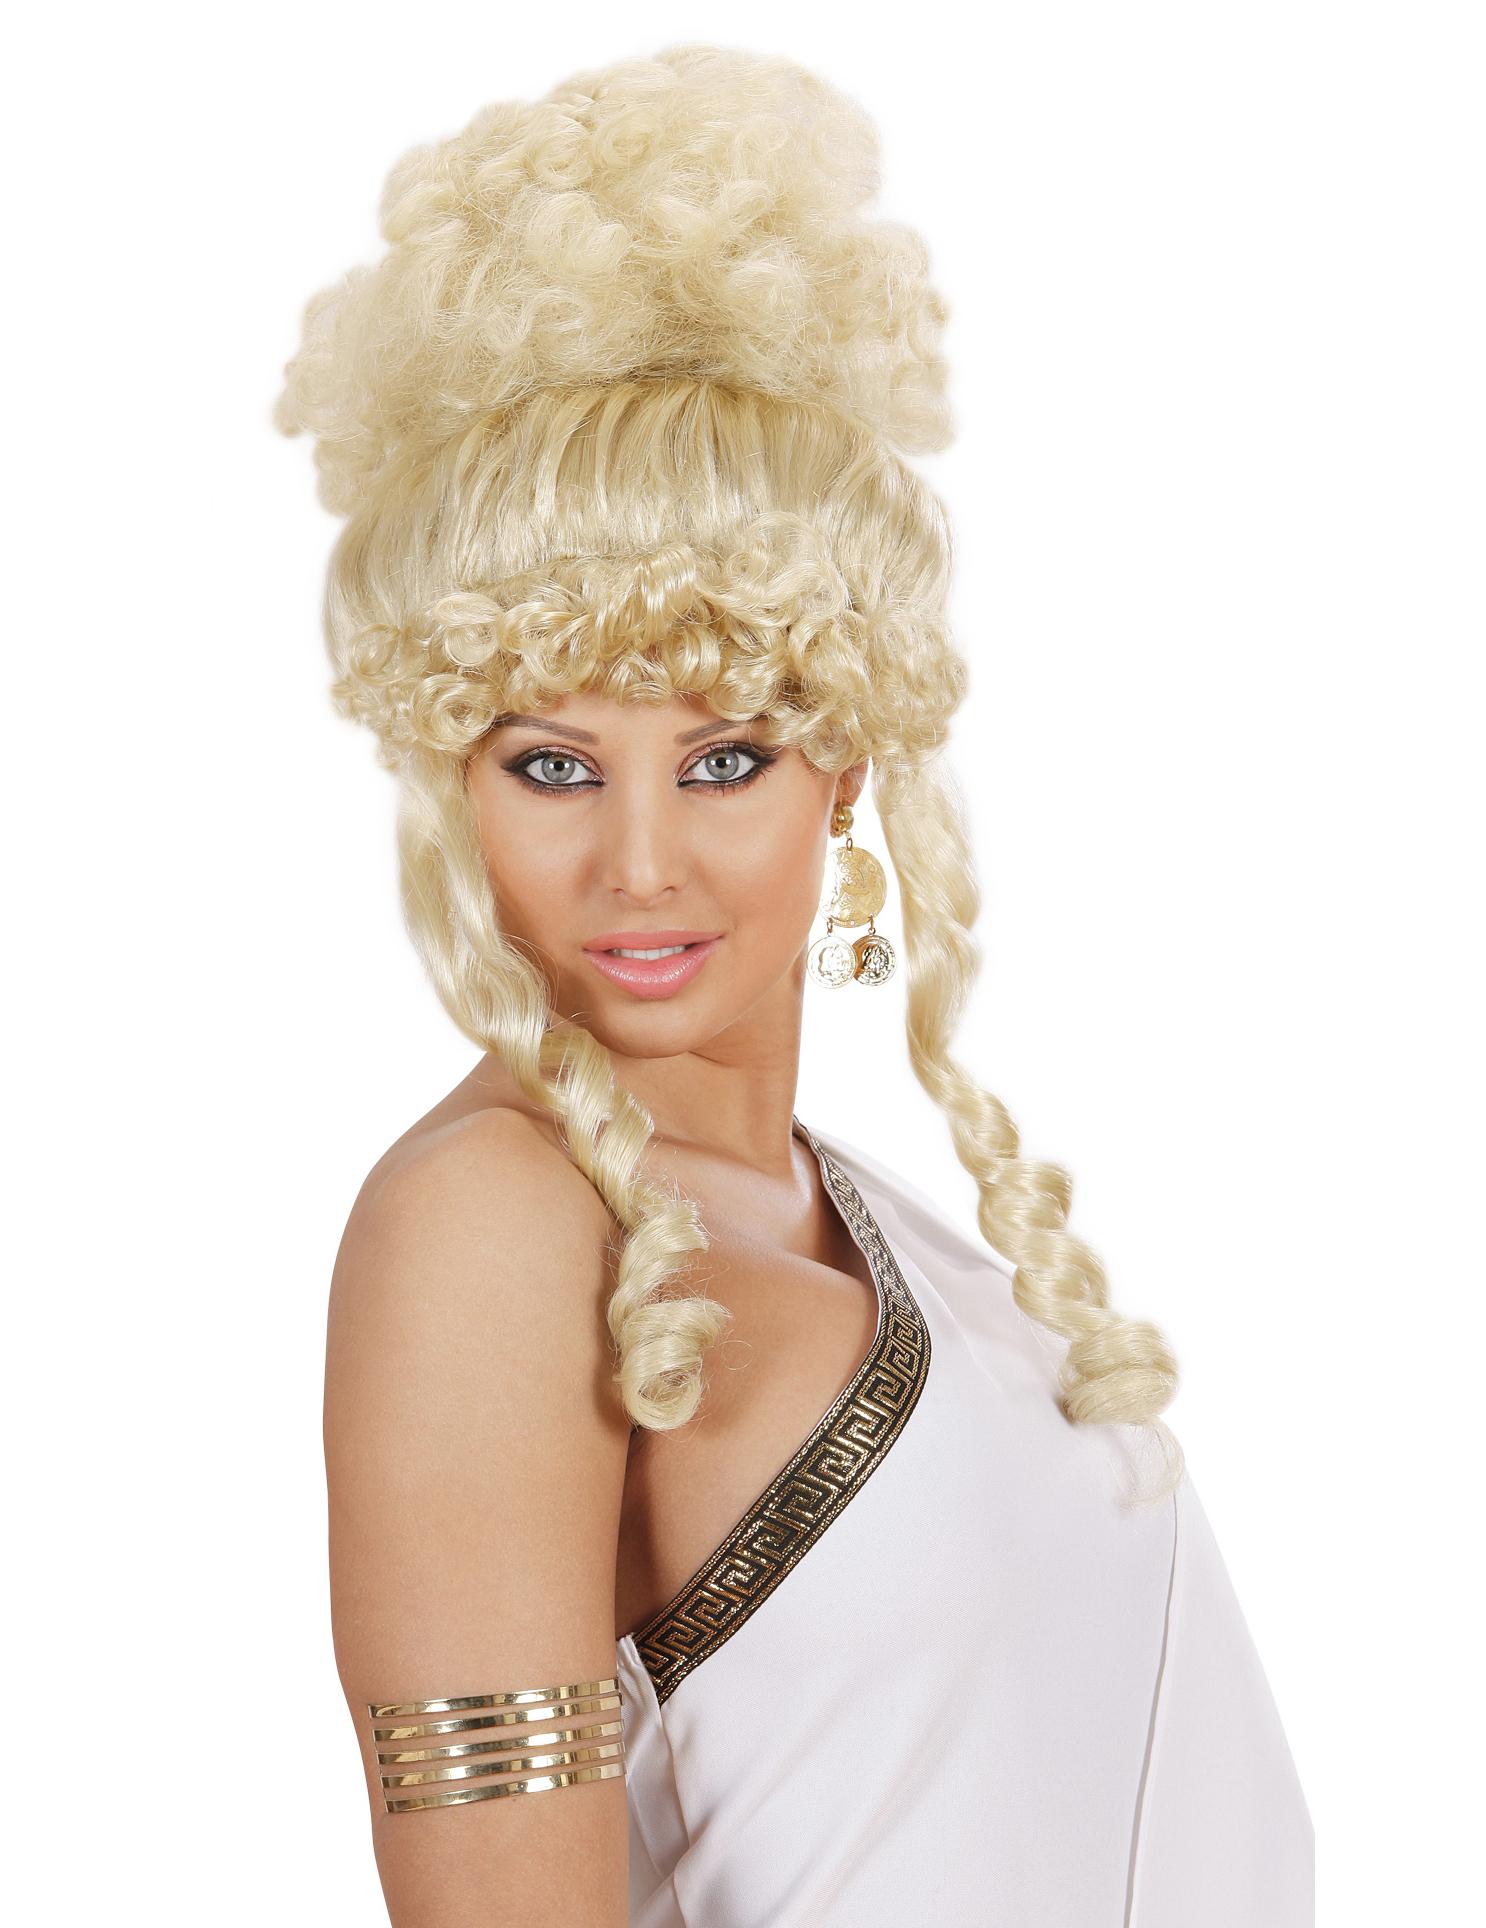 Blonde Göttin-Perücke für Damen. 39357